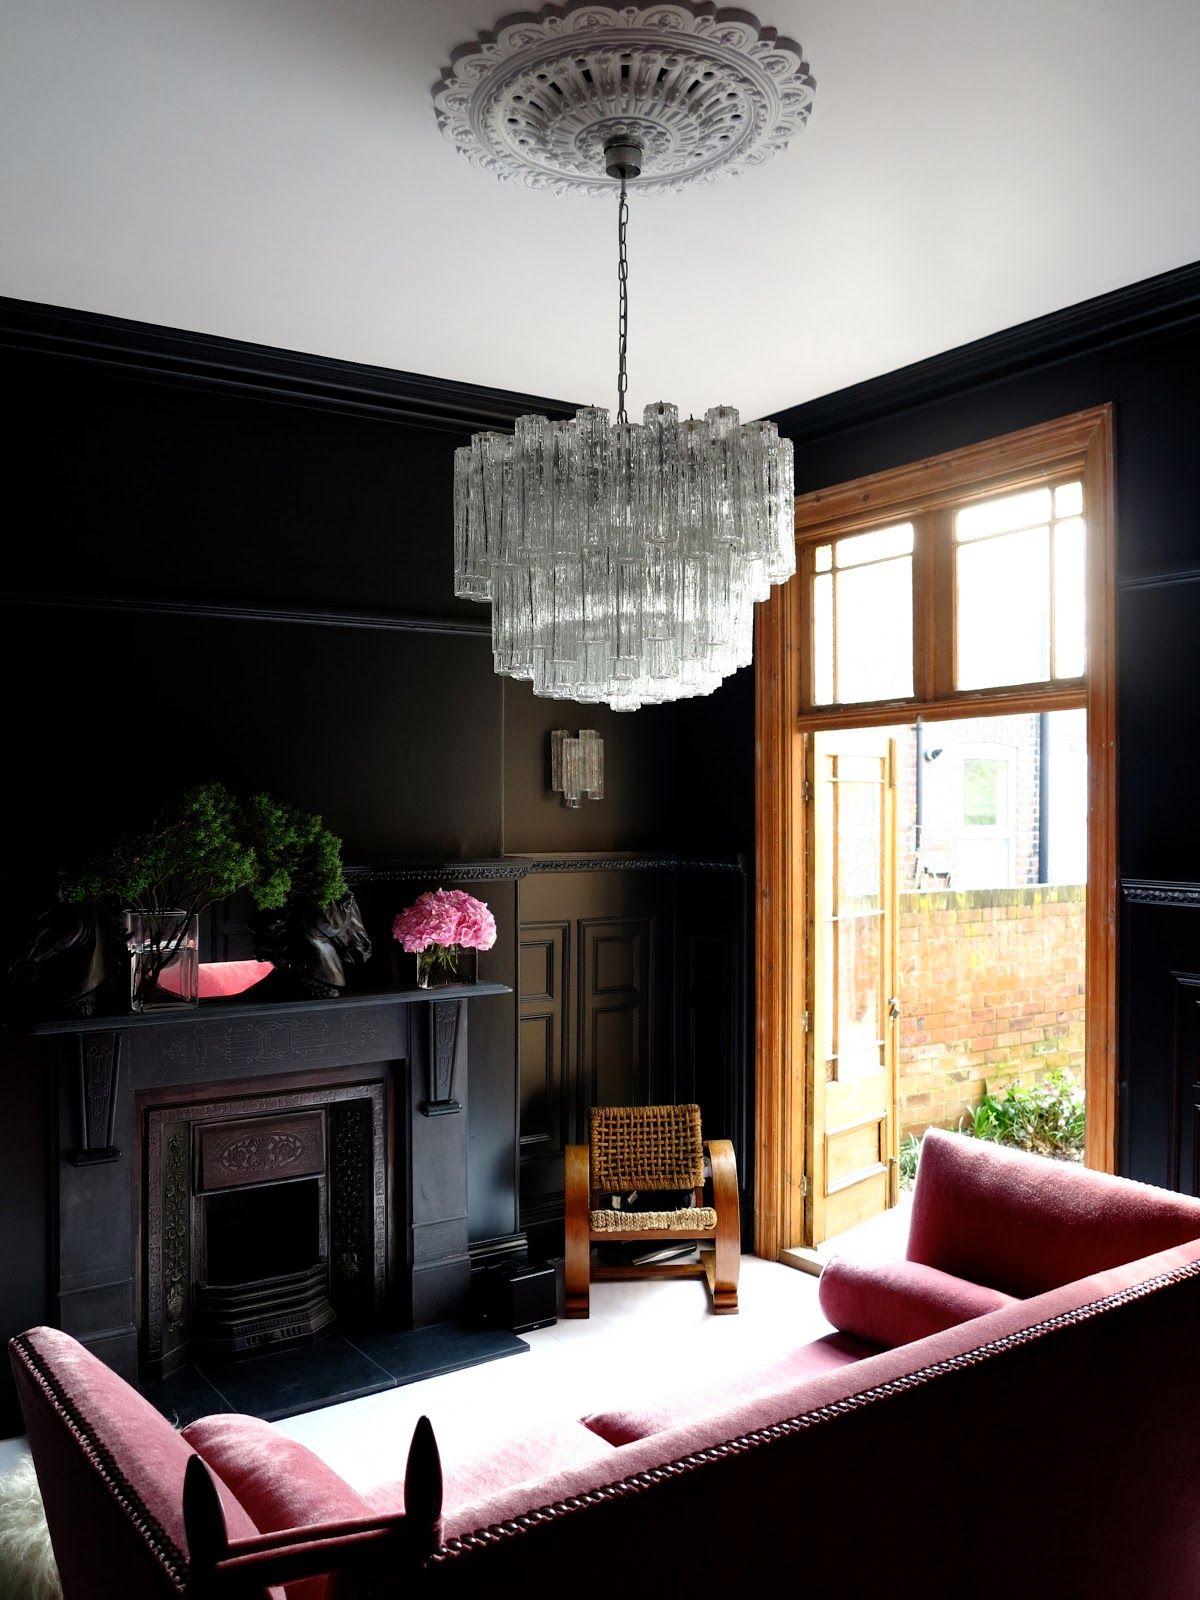 fab chandelier hot pink sofa dark walls cool rooms dark rh pinterest com